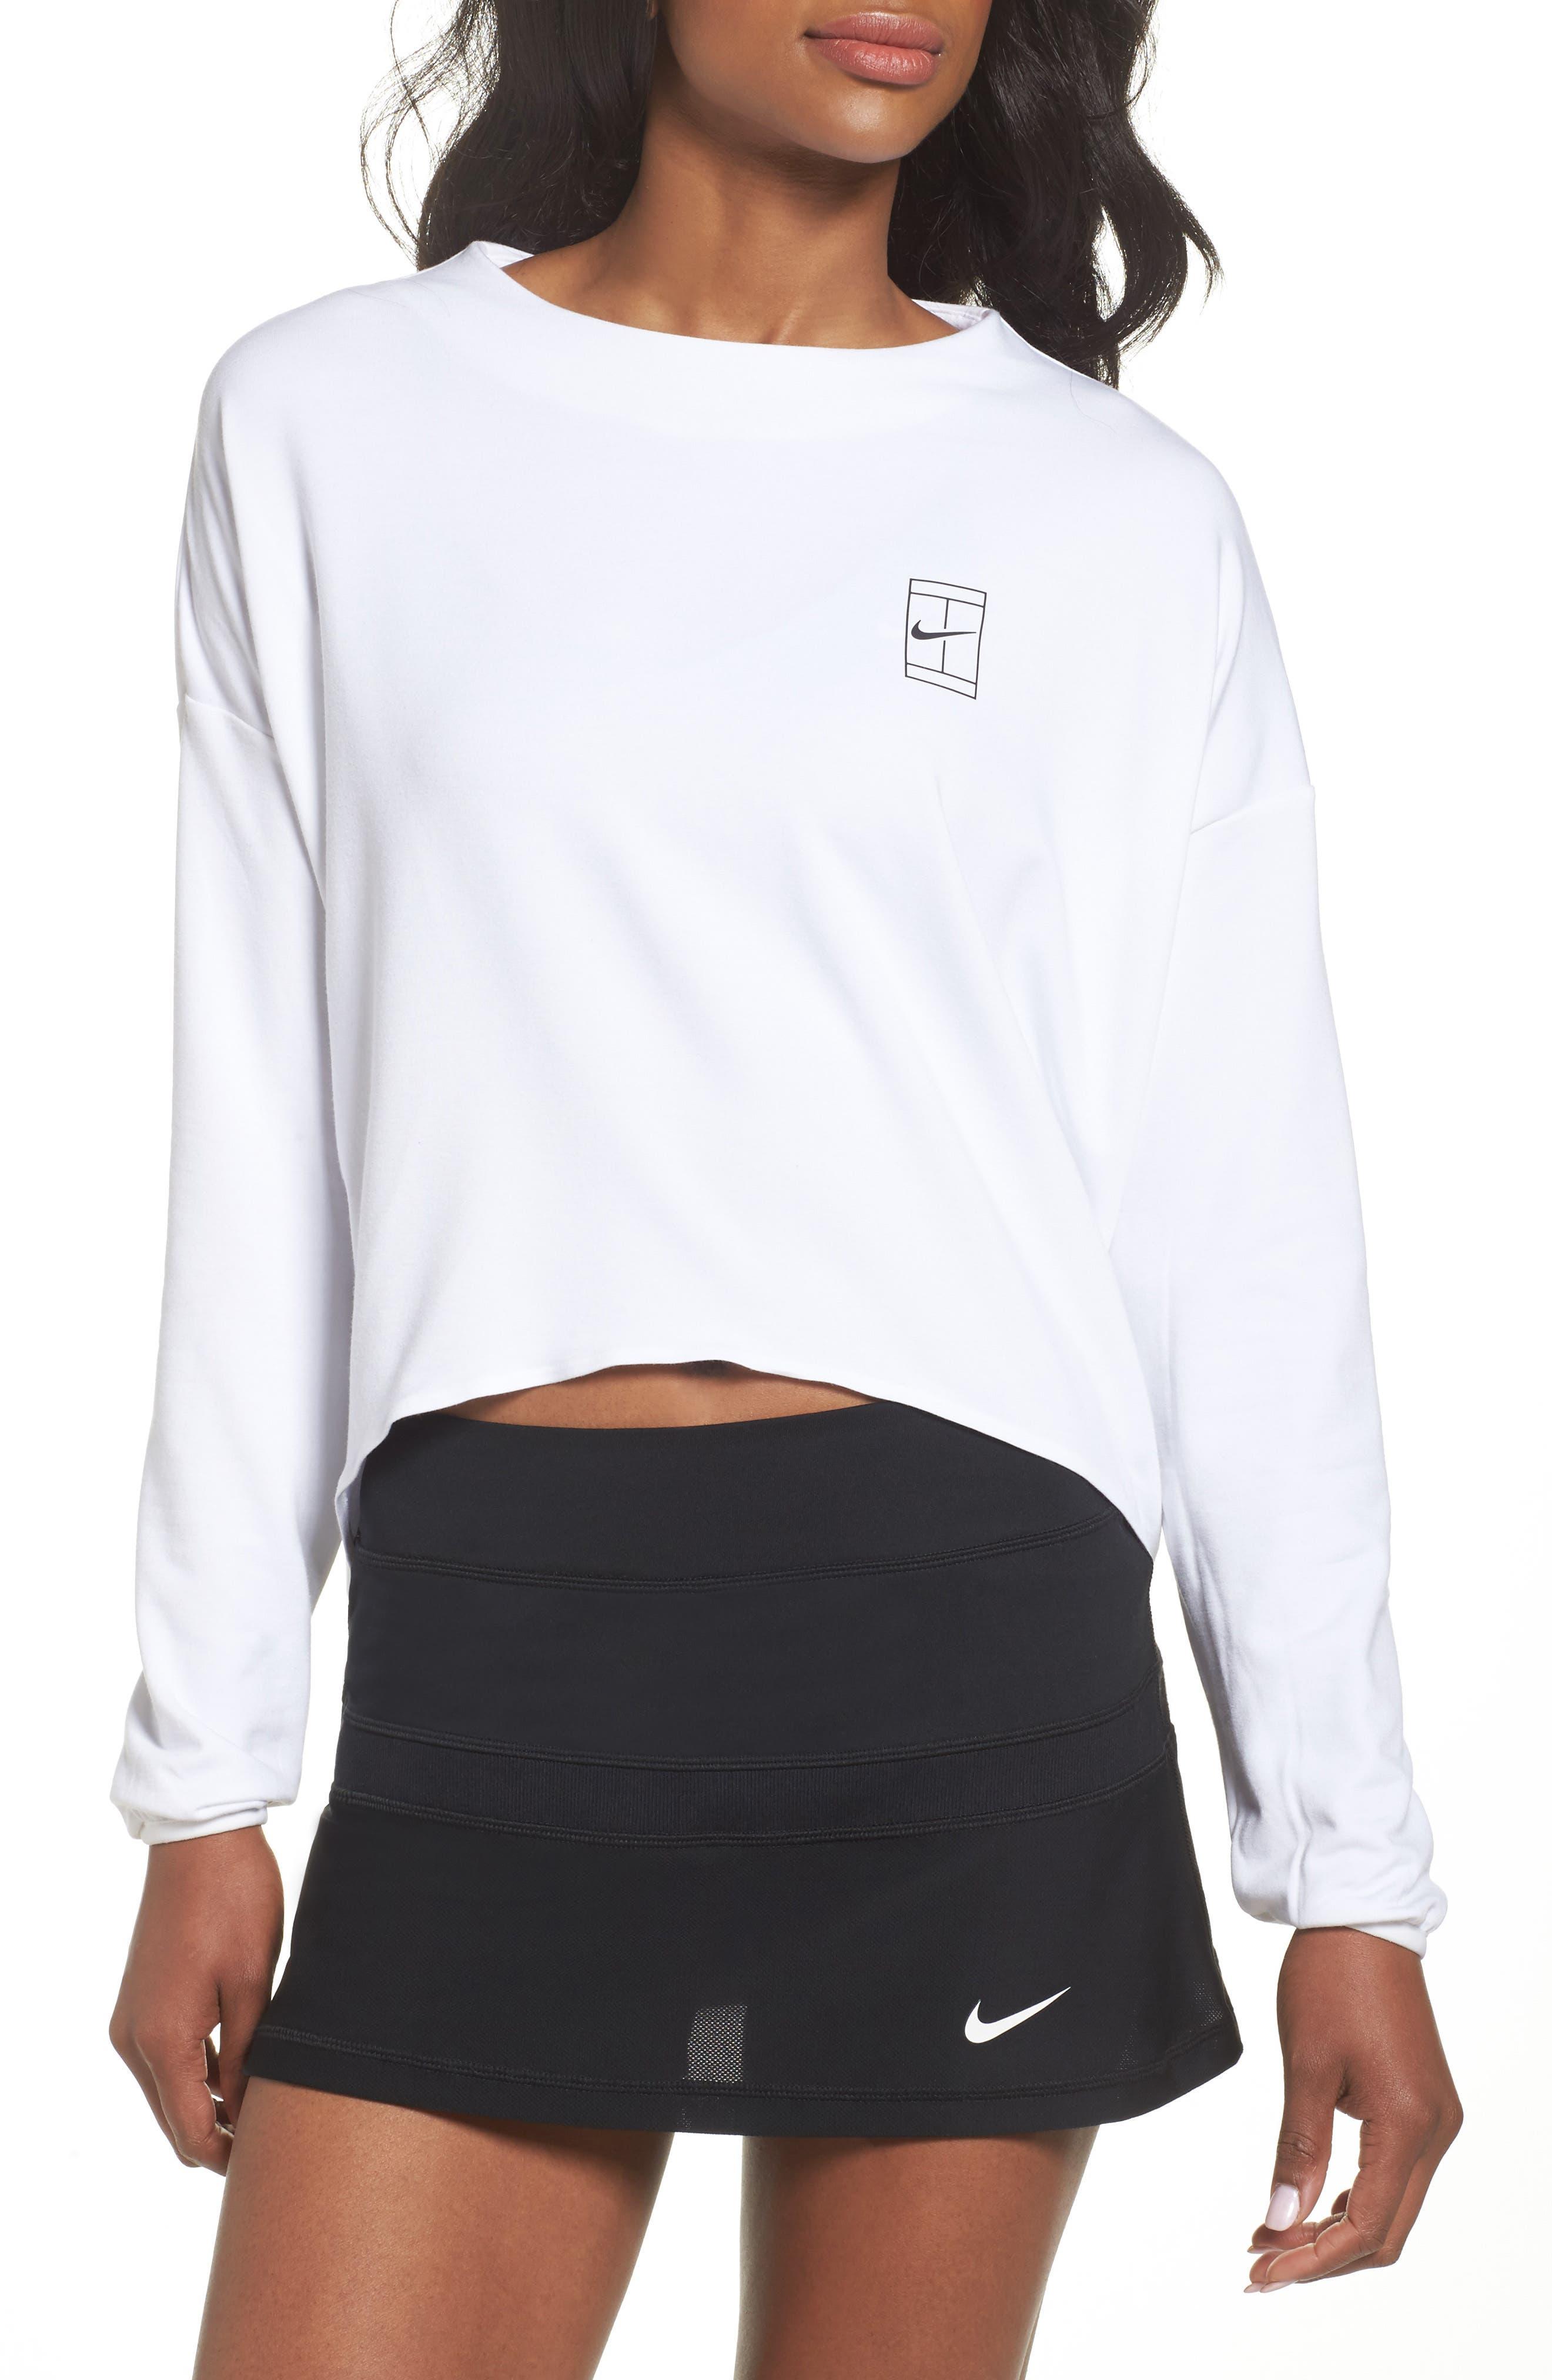 Court Dri-FIT Long Sleeve Tennis Top,                             Main thumbnail 1, color,                             White/ White/ Black